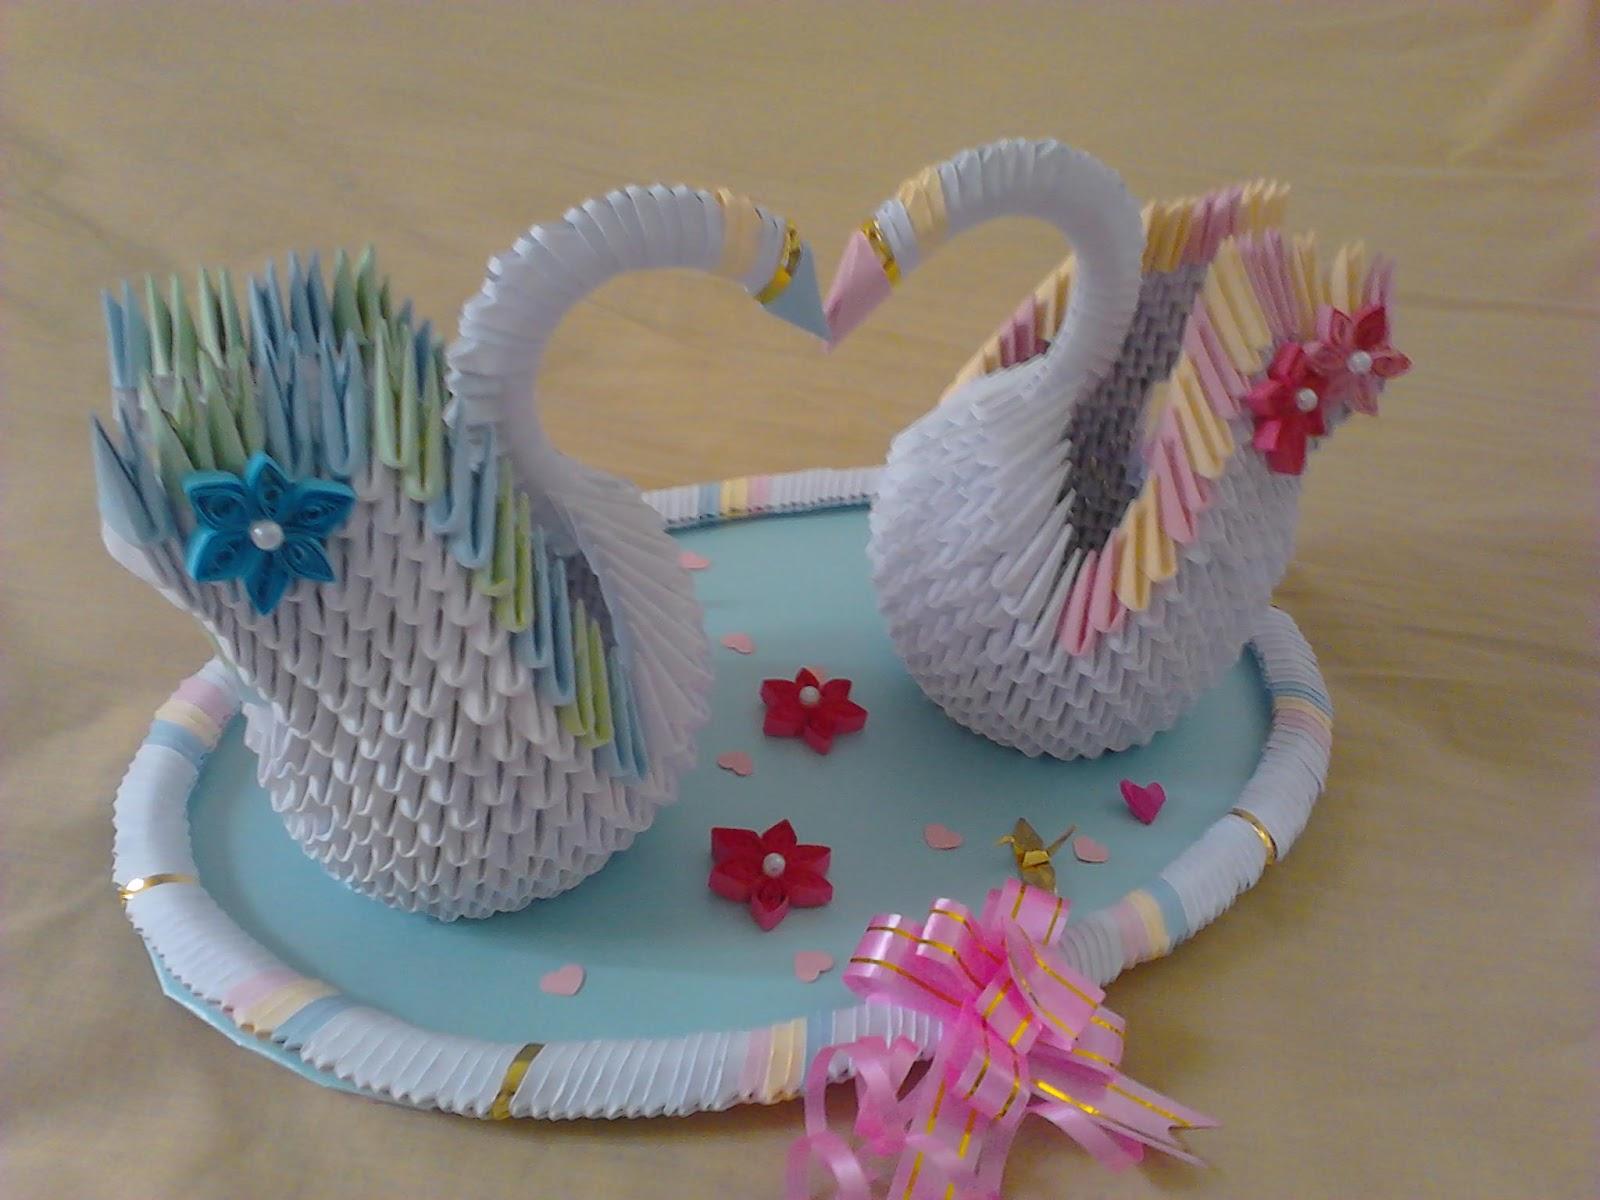 Jewellia handicrafts: 3D origami wedding swans - photo#39